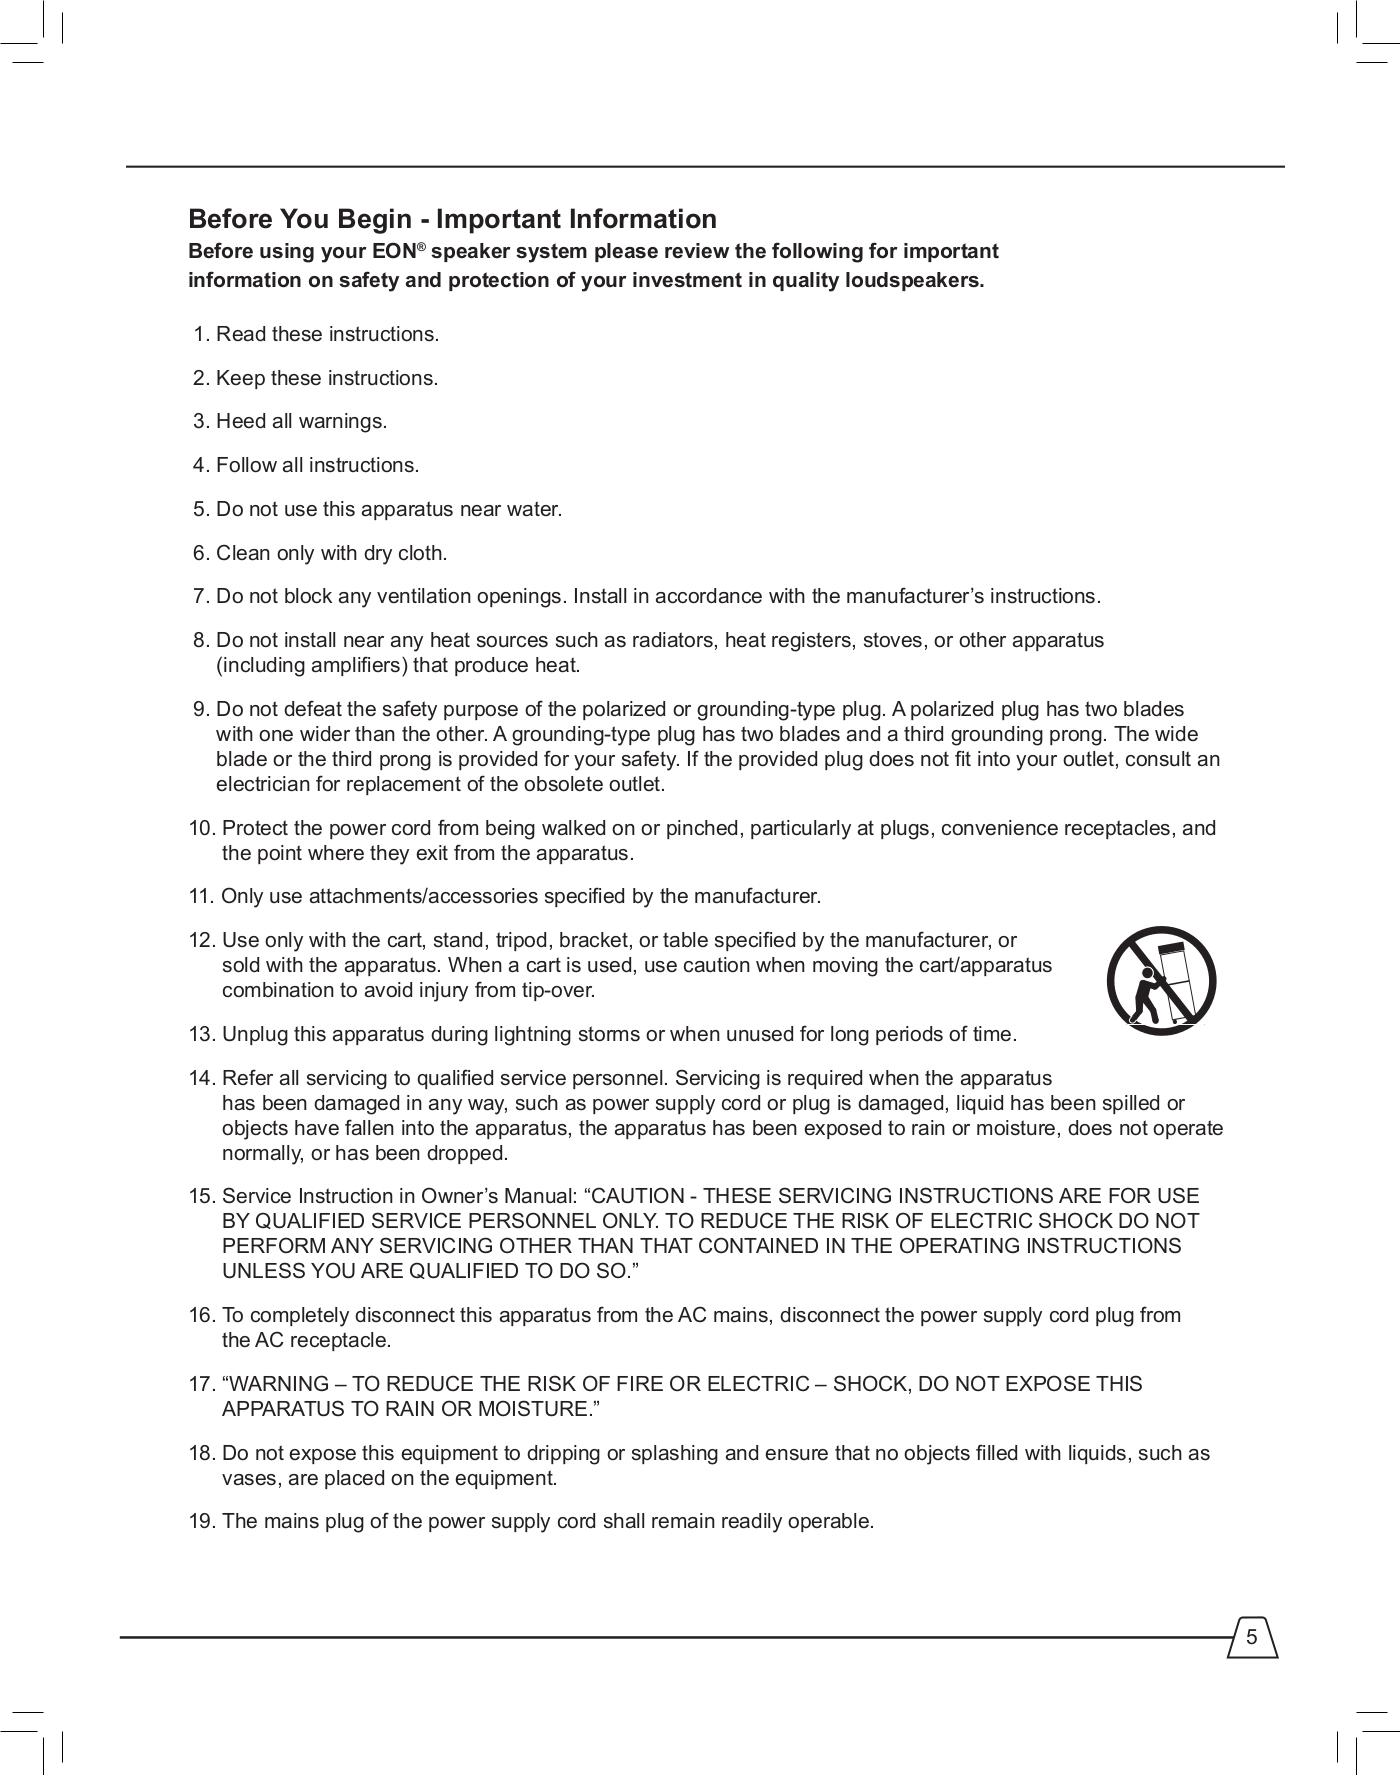 aircraft maintenance manual amm justin eddleman 1 manuals and rh myxersocialradio com